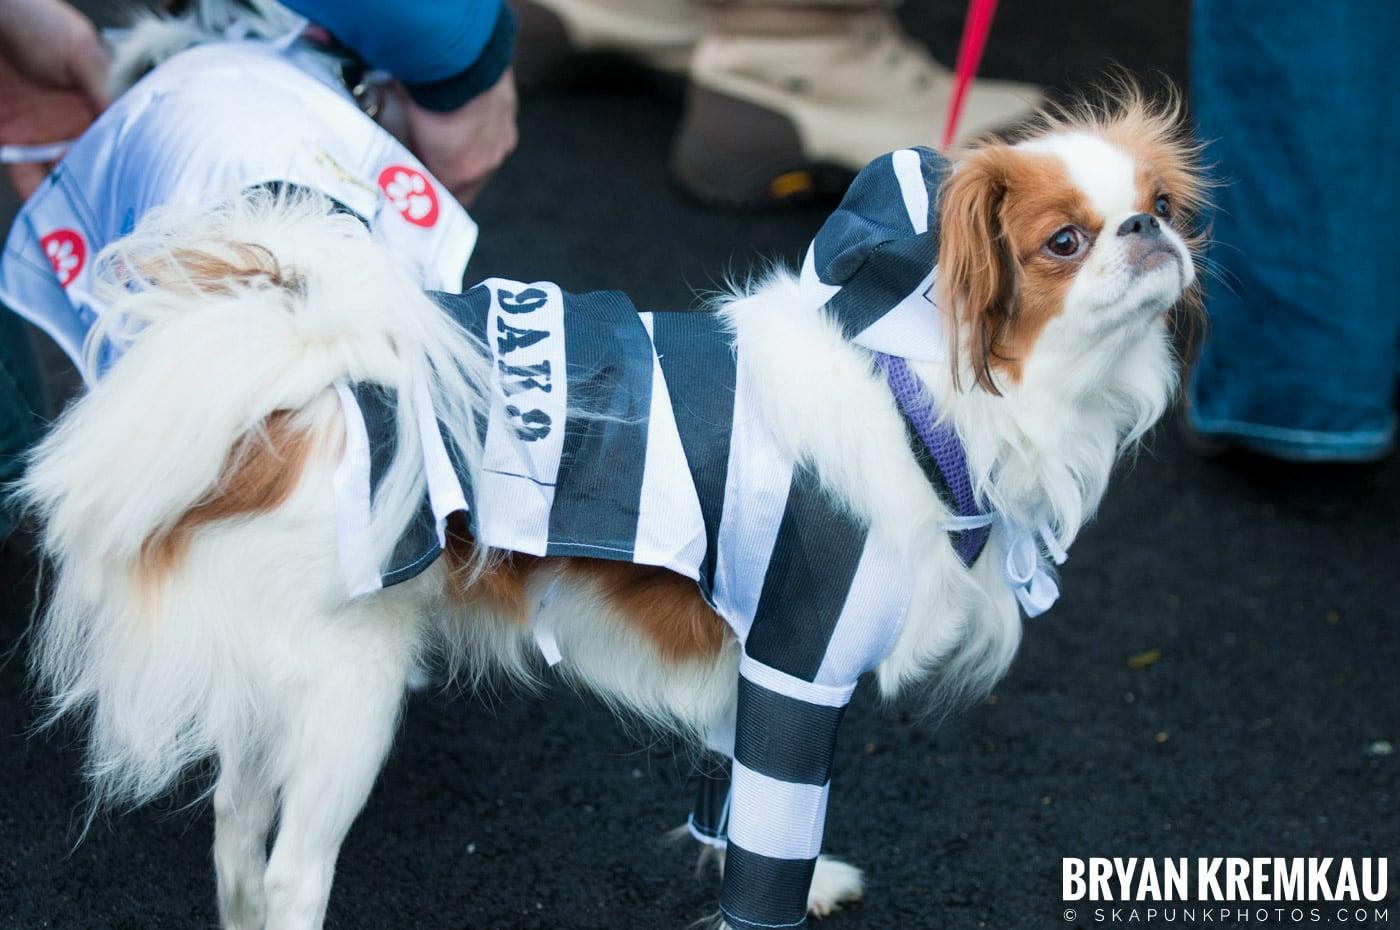 Paulus Hook Halloween Pet Parade 2011 @ Jersey City, NJ - 10.30.11 (70)